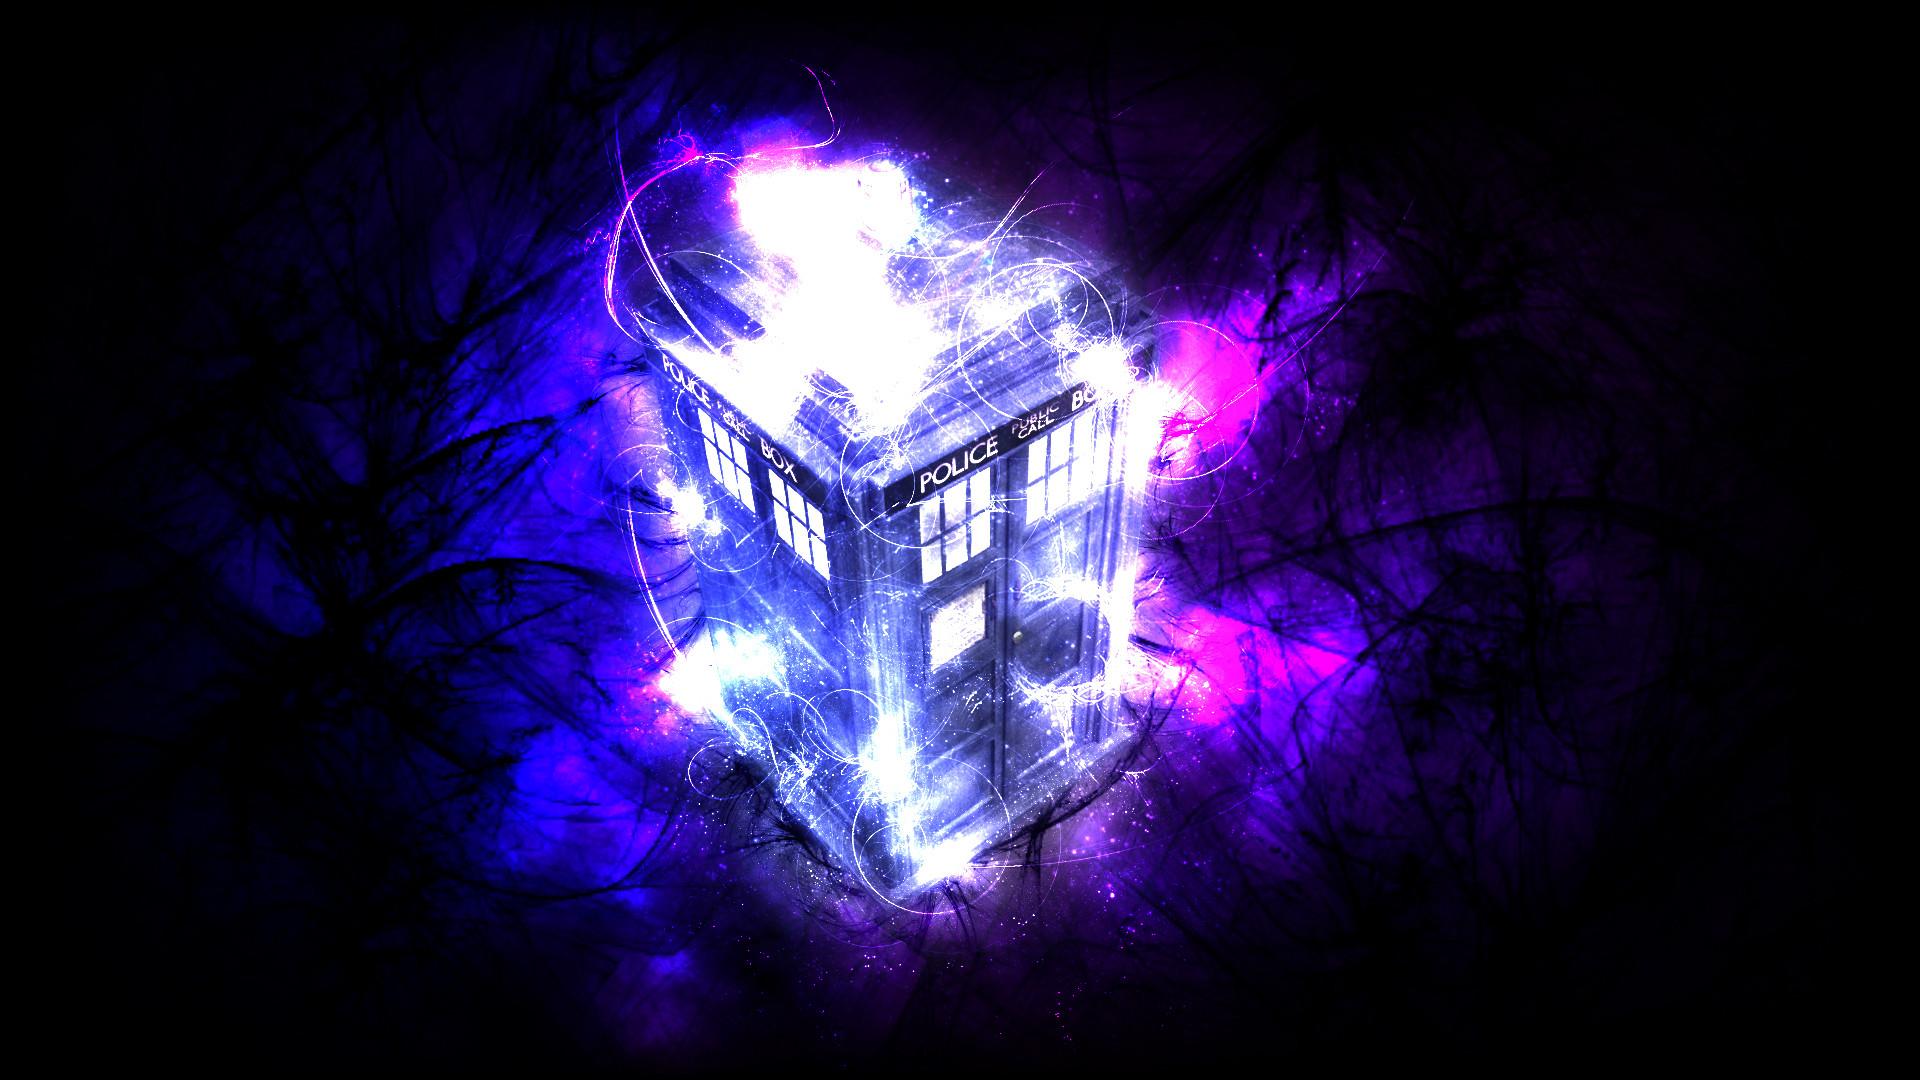 Hd Desktop Wallpaper – tardis doctor who – .